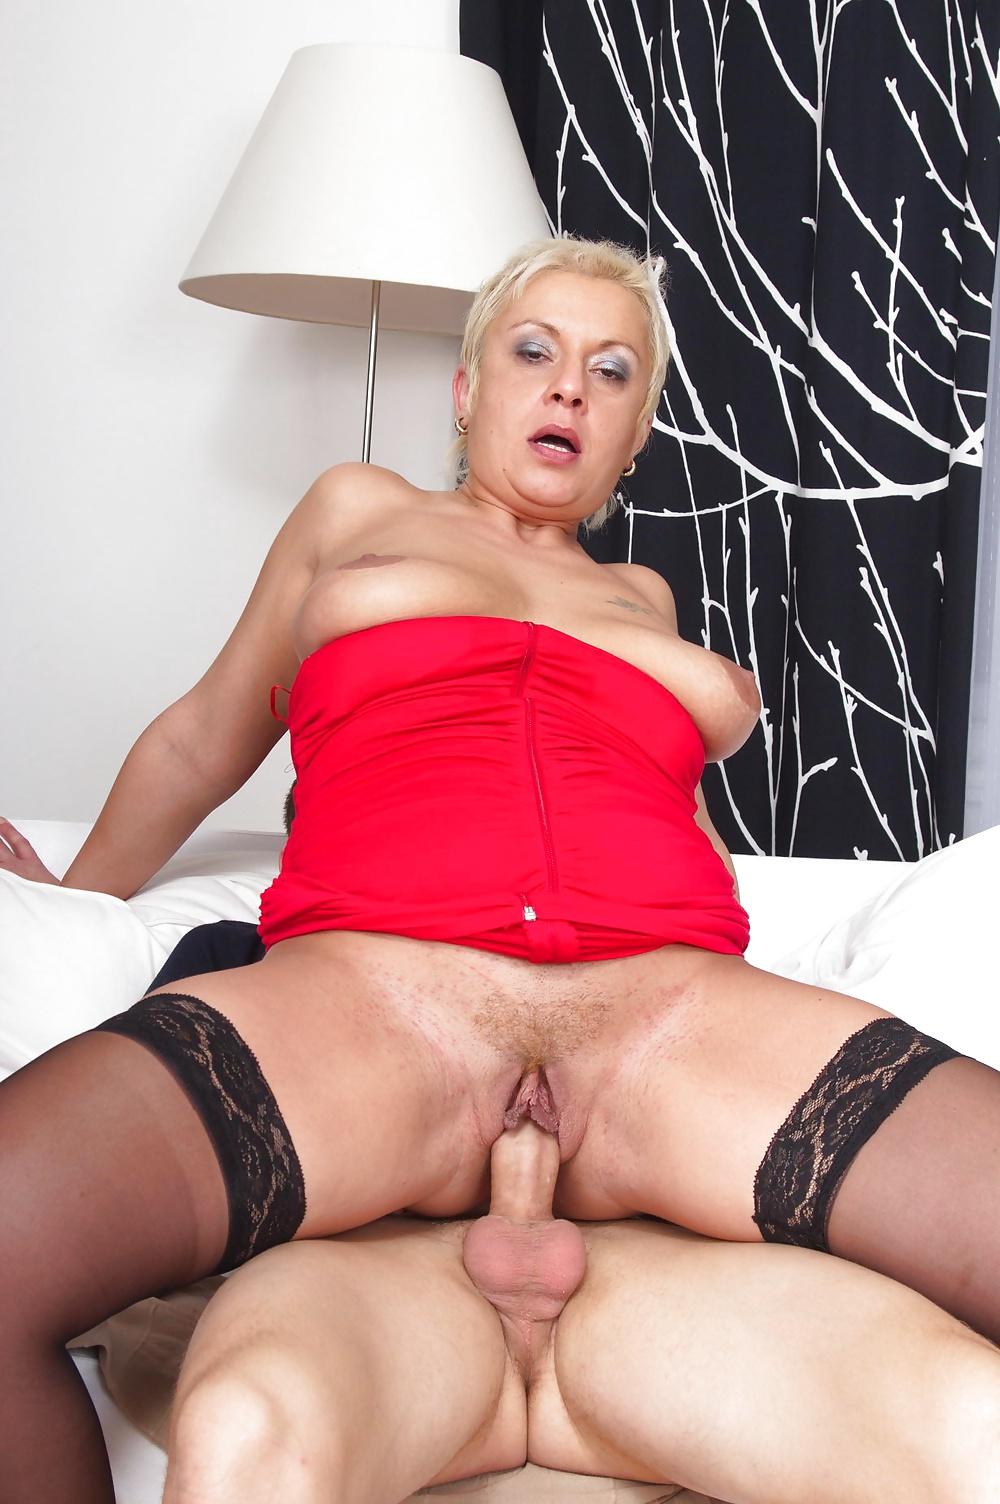 xxx-barbain-women-sexy-petite-nude-adult-babe